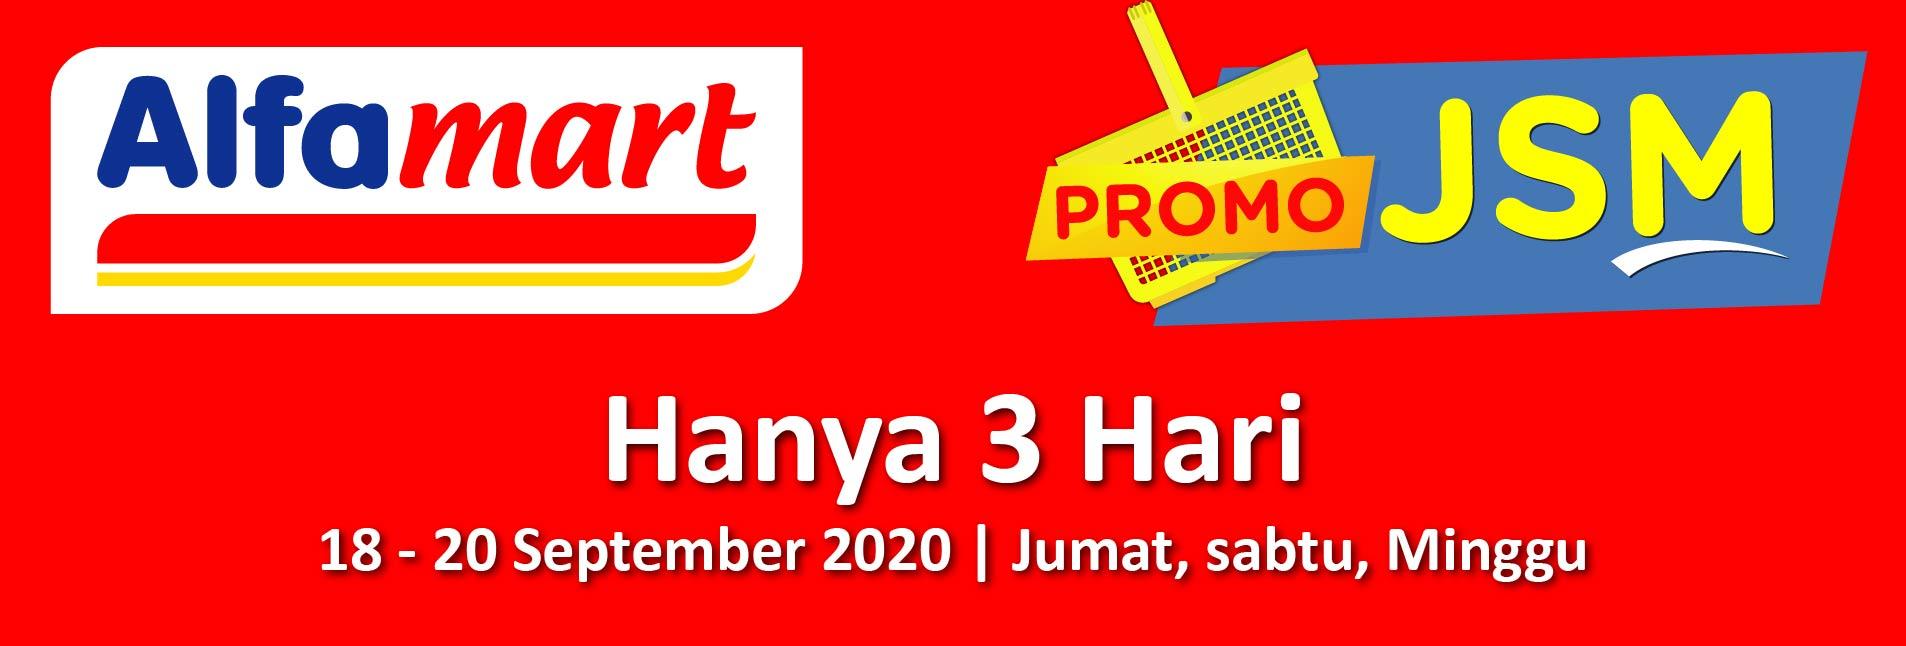 Promo JSM 18 - 20 September 2020